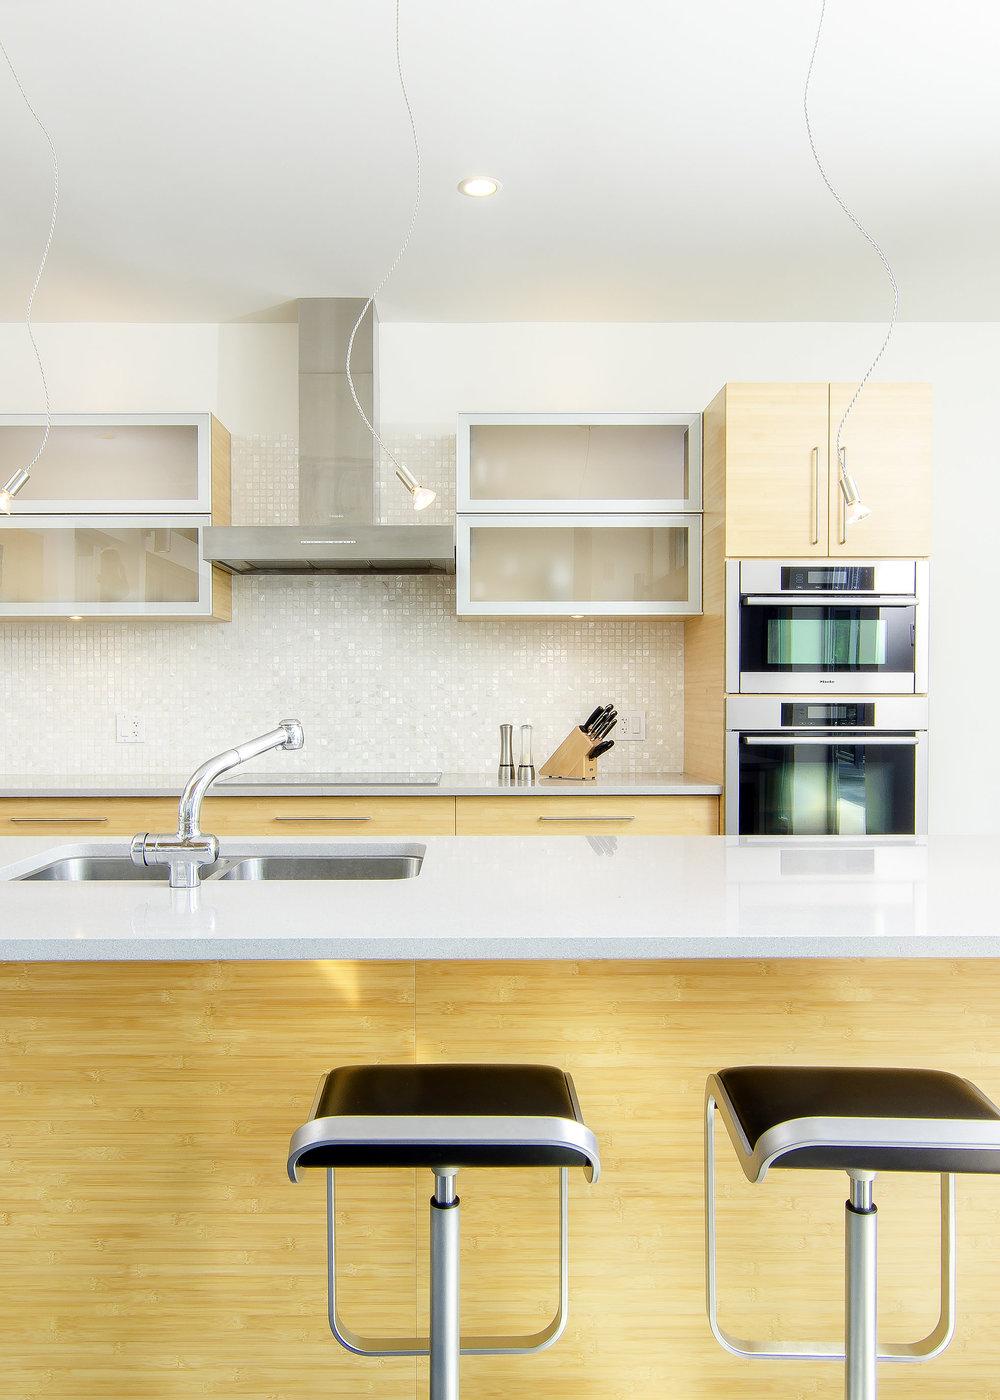 Residential kitchen in Gulf Island Private architectural home design